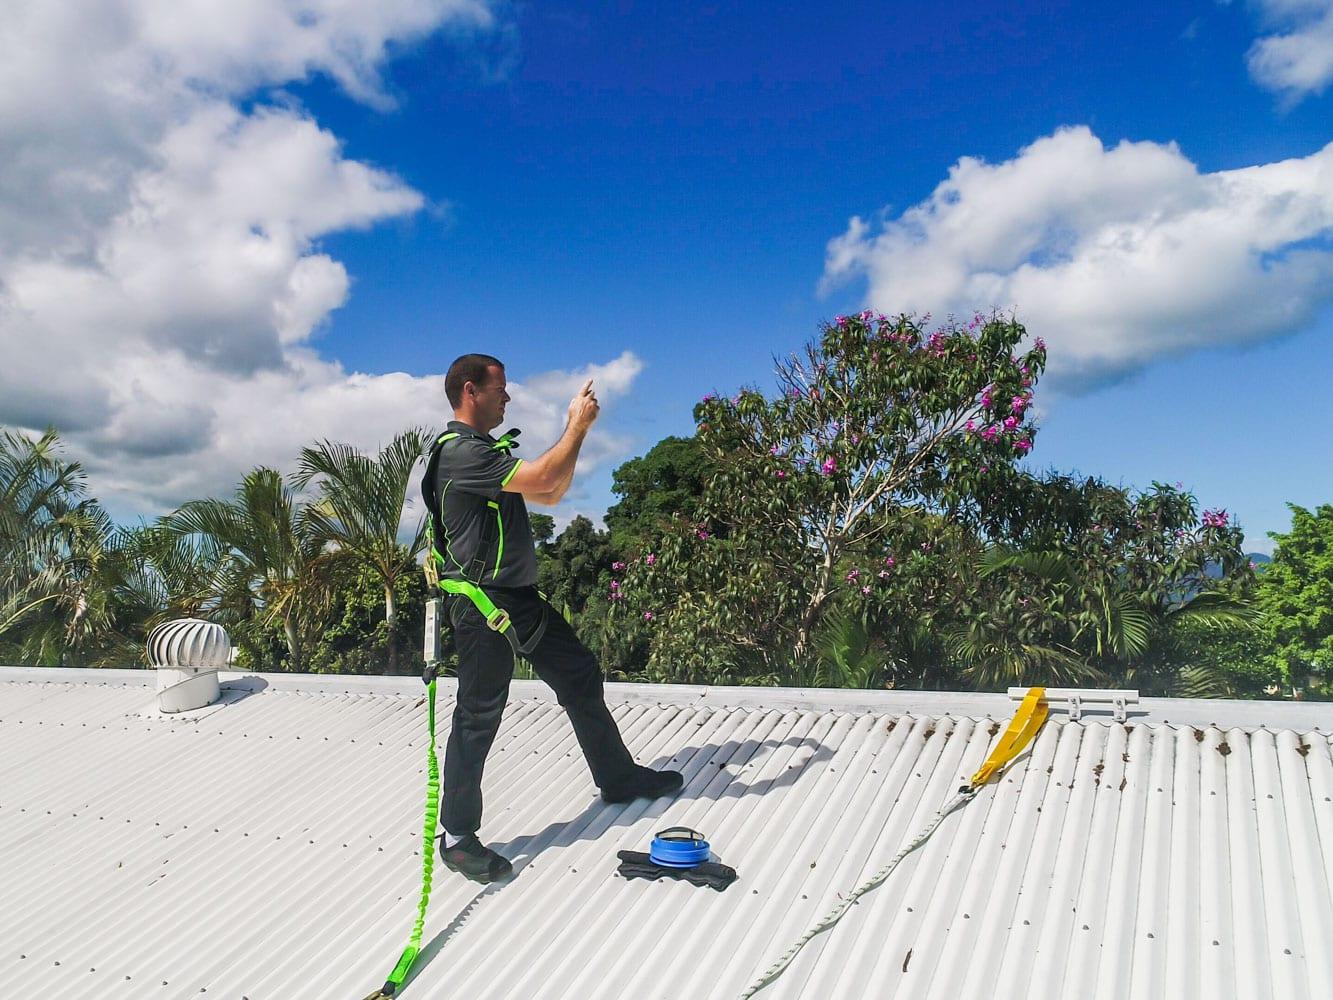 Solar Systems Cairns - Elliot fox checks surrounding trees